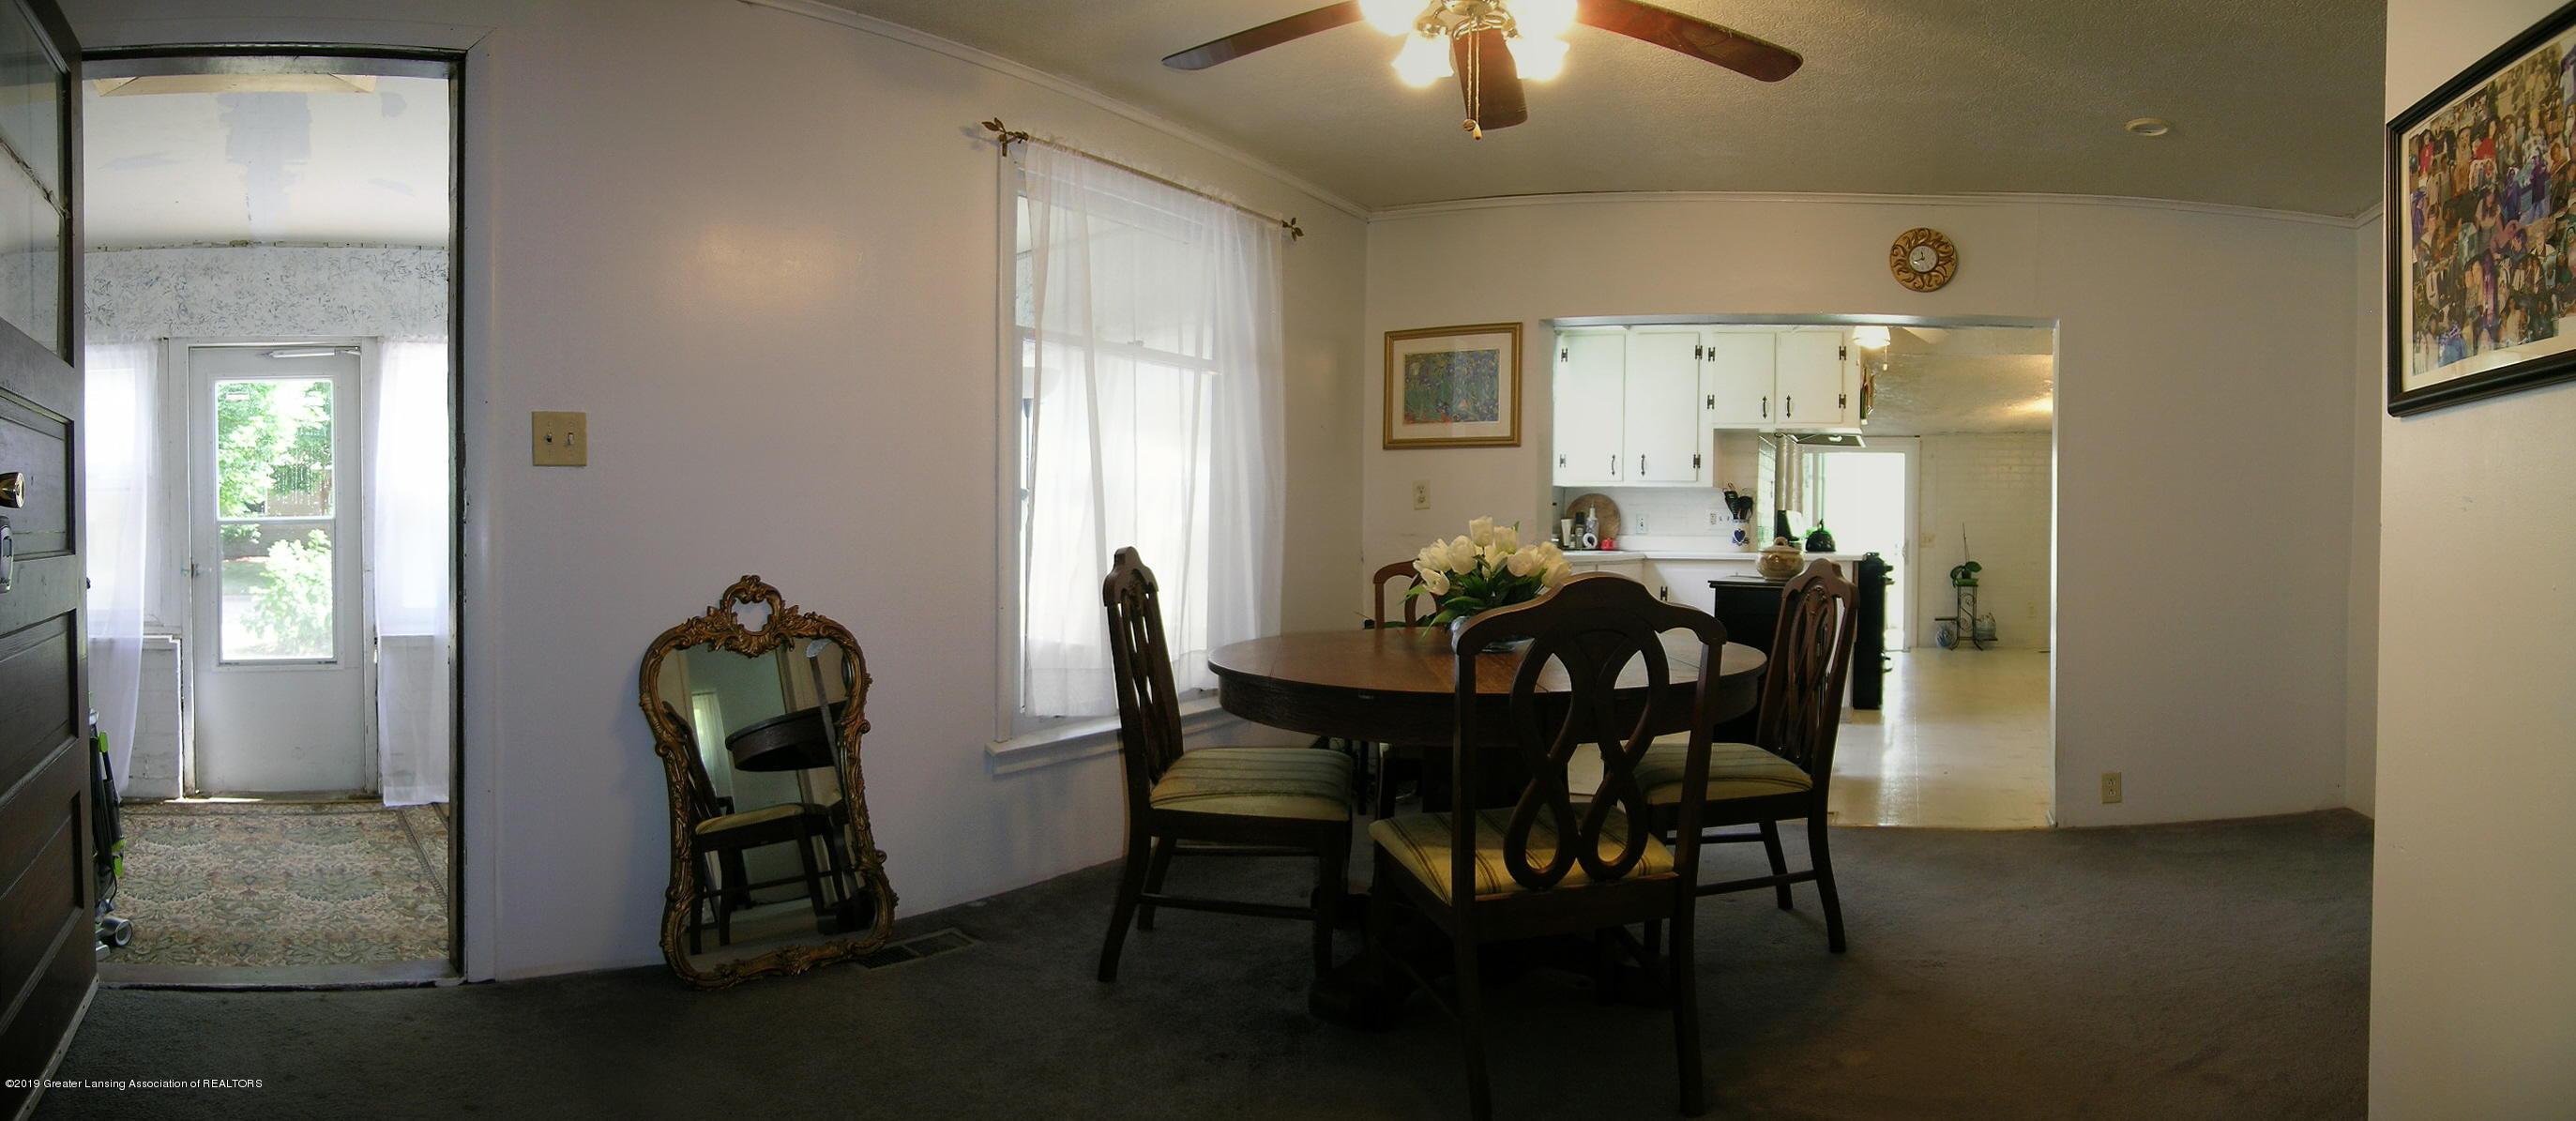 413 W Shepherd St - 5 Dining Room - 5